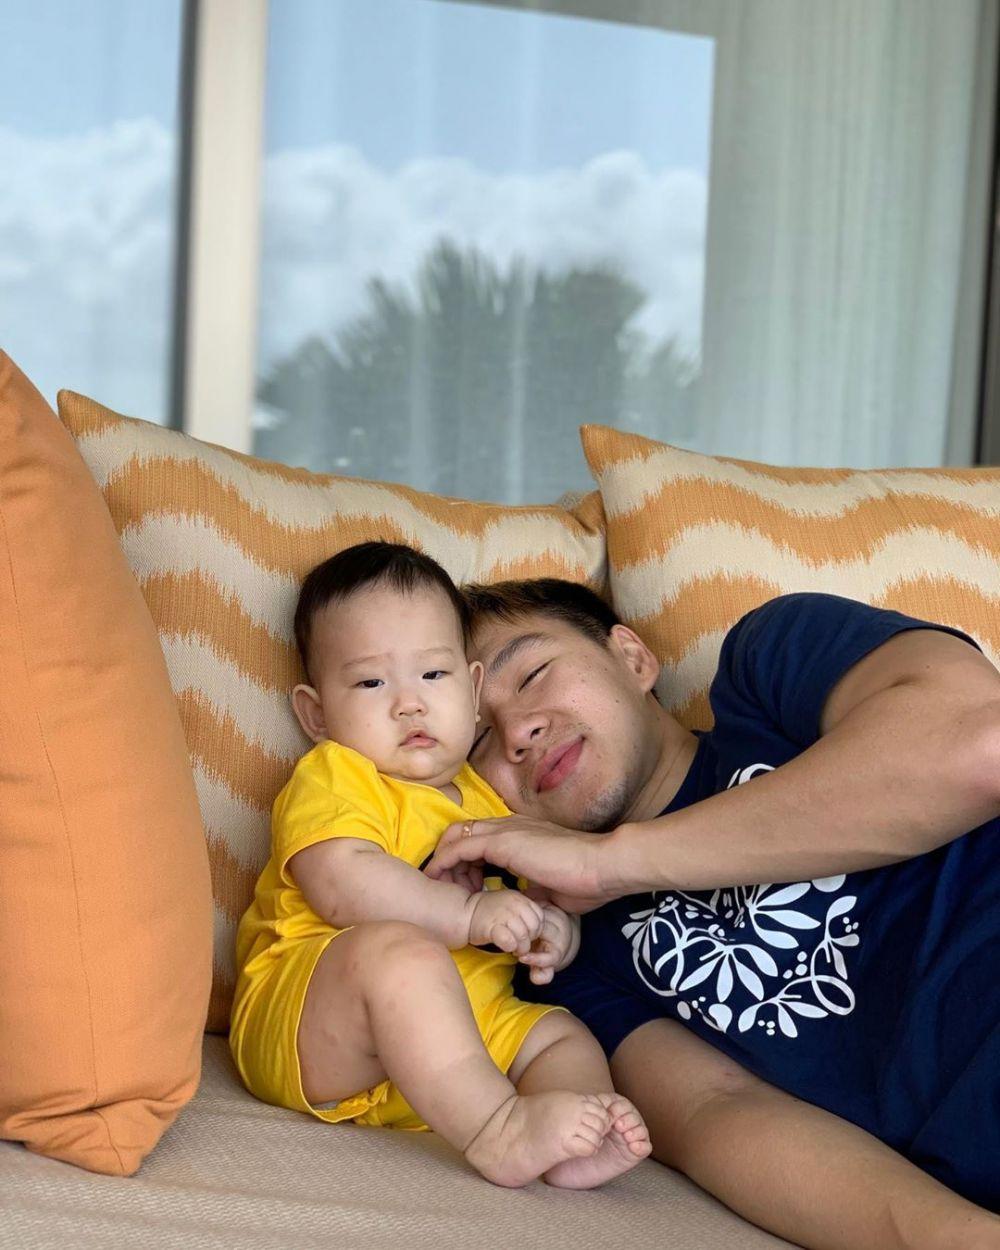 11 Potret Manis Marcus Fernaldi Bareng Putranya Jr, Bikin Gemes!